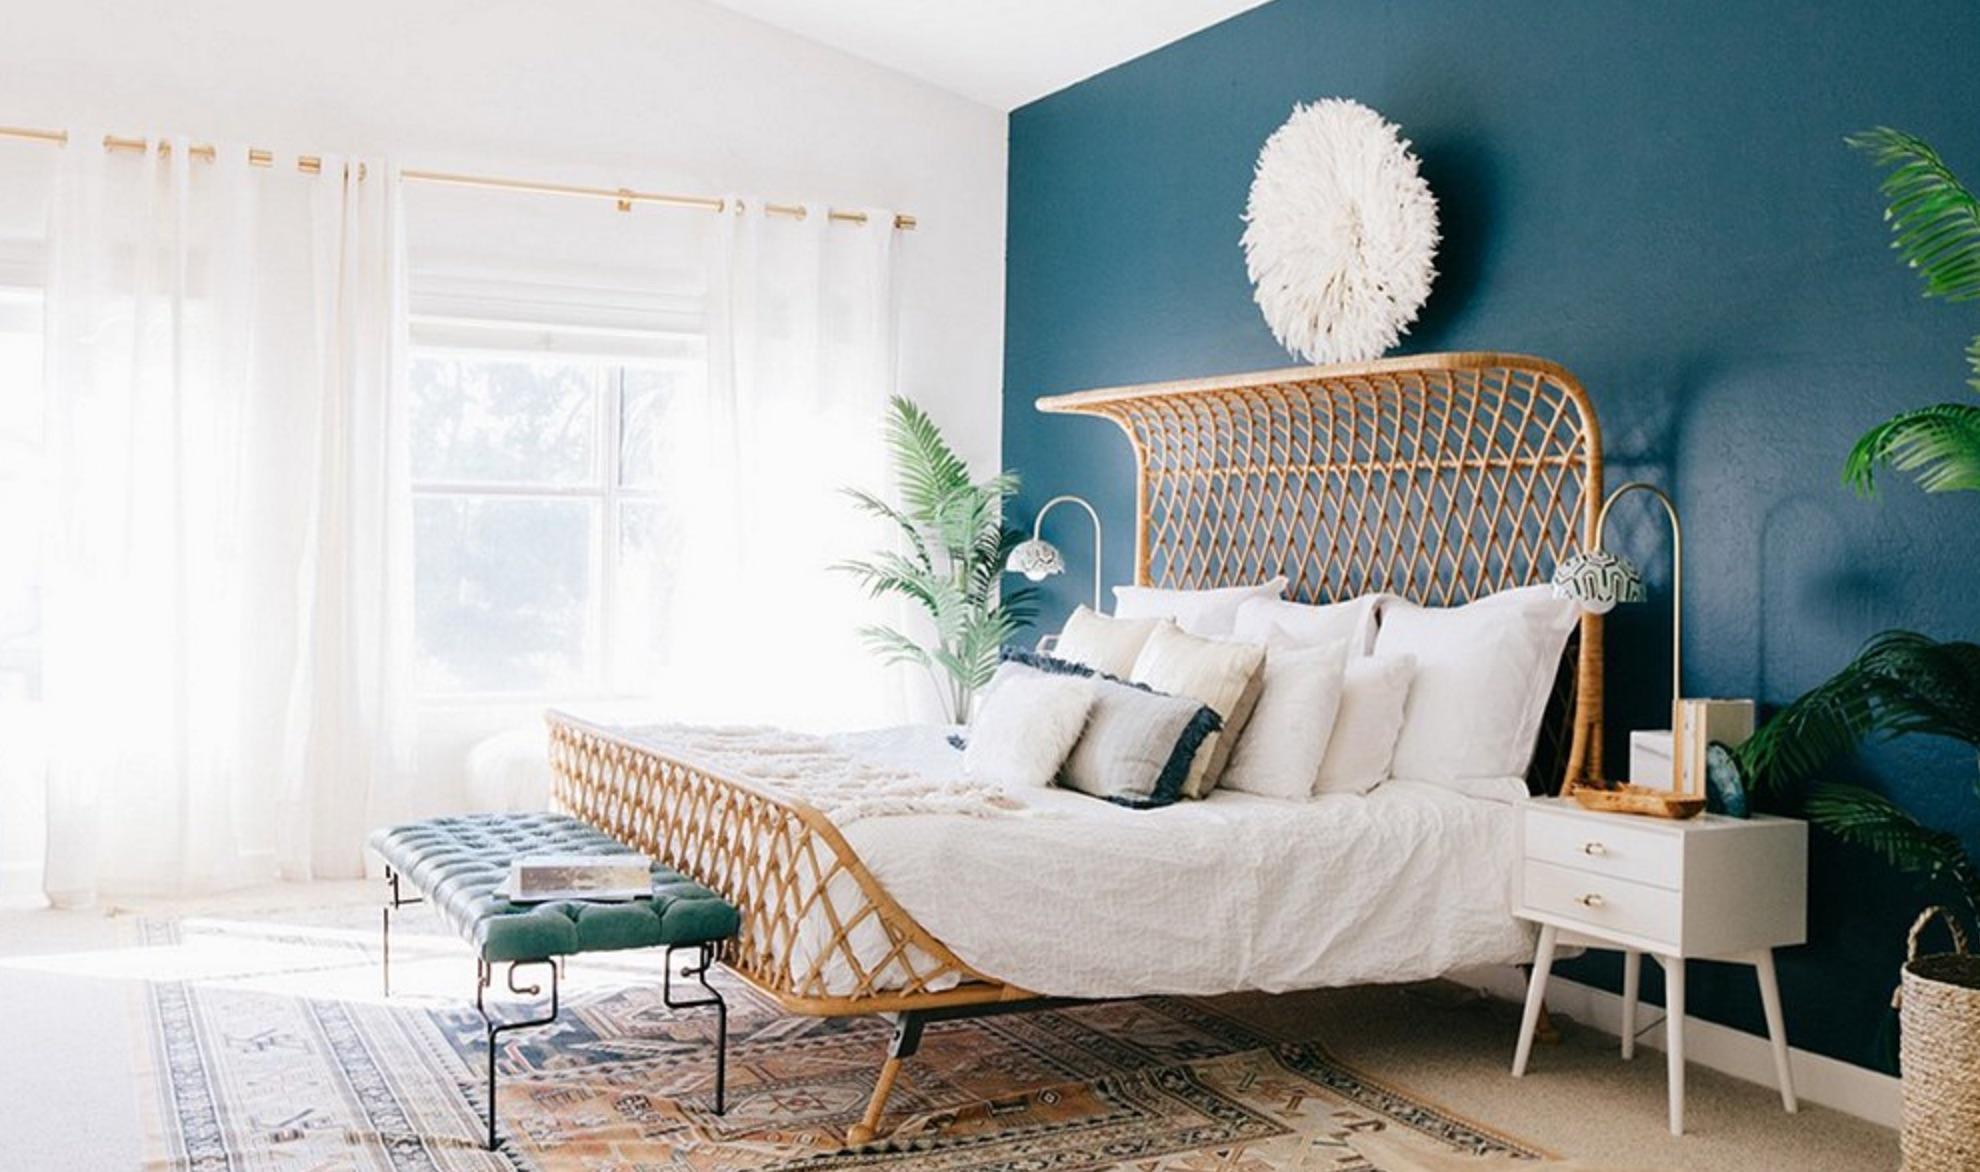 Boho feature bedroom wall